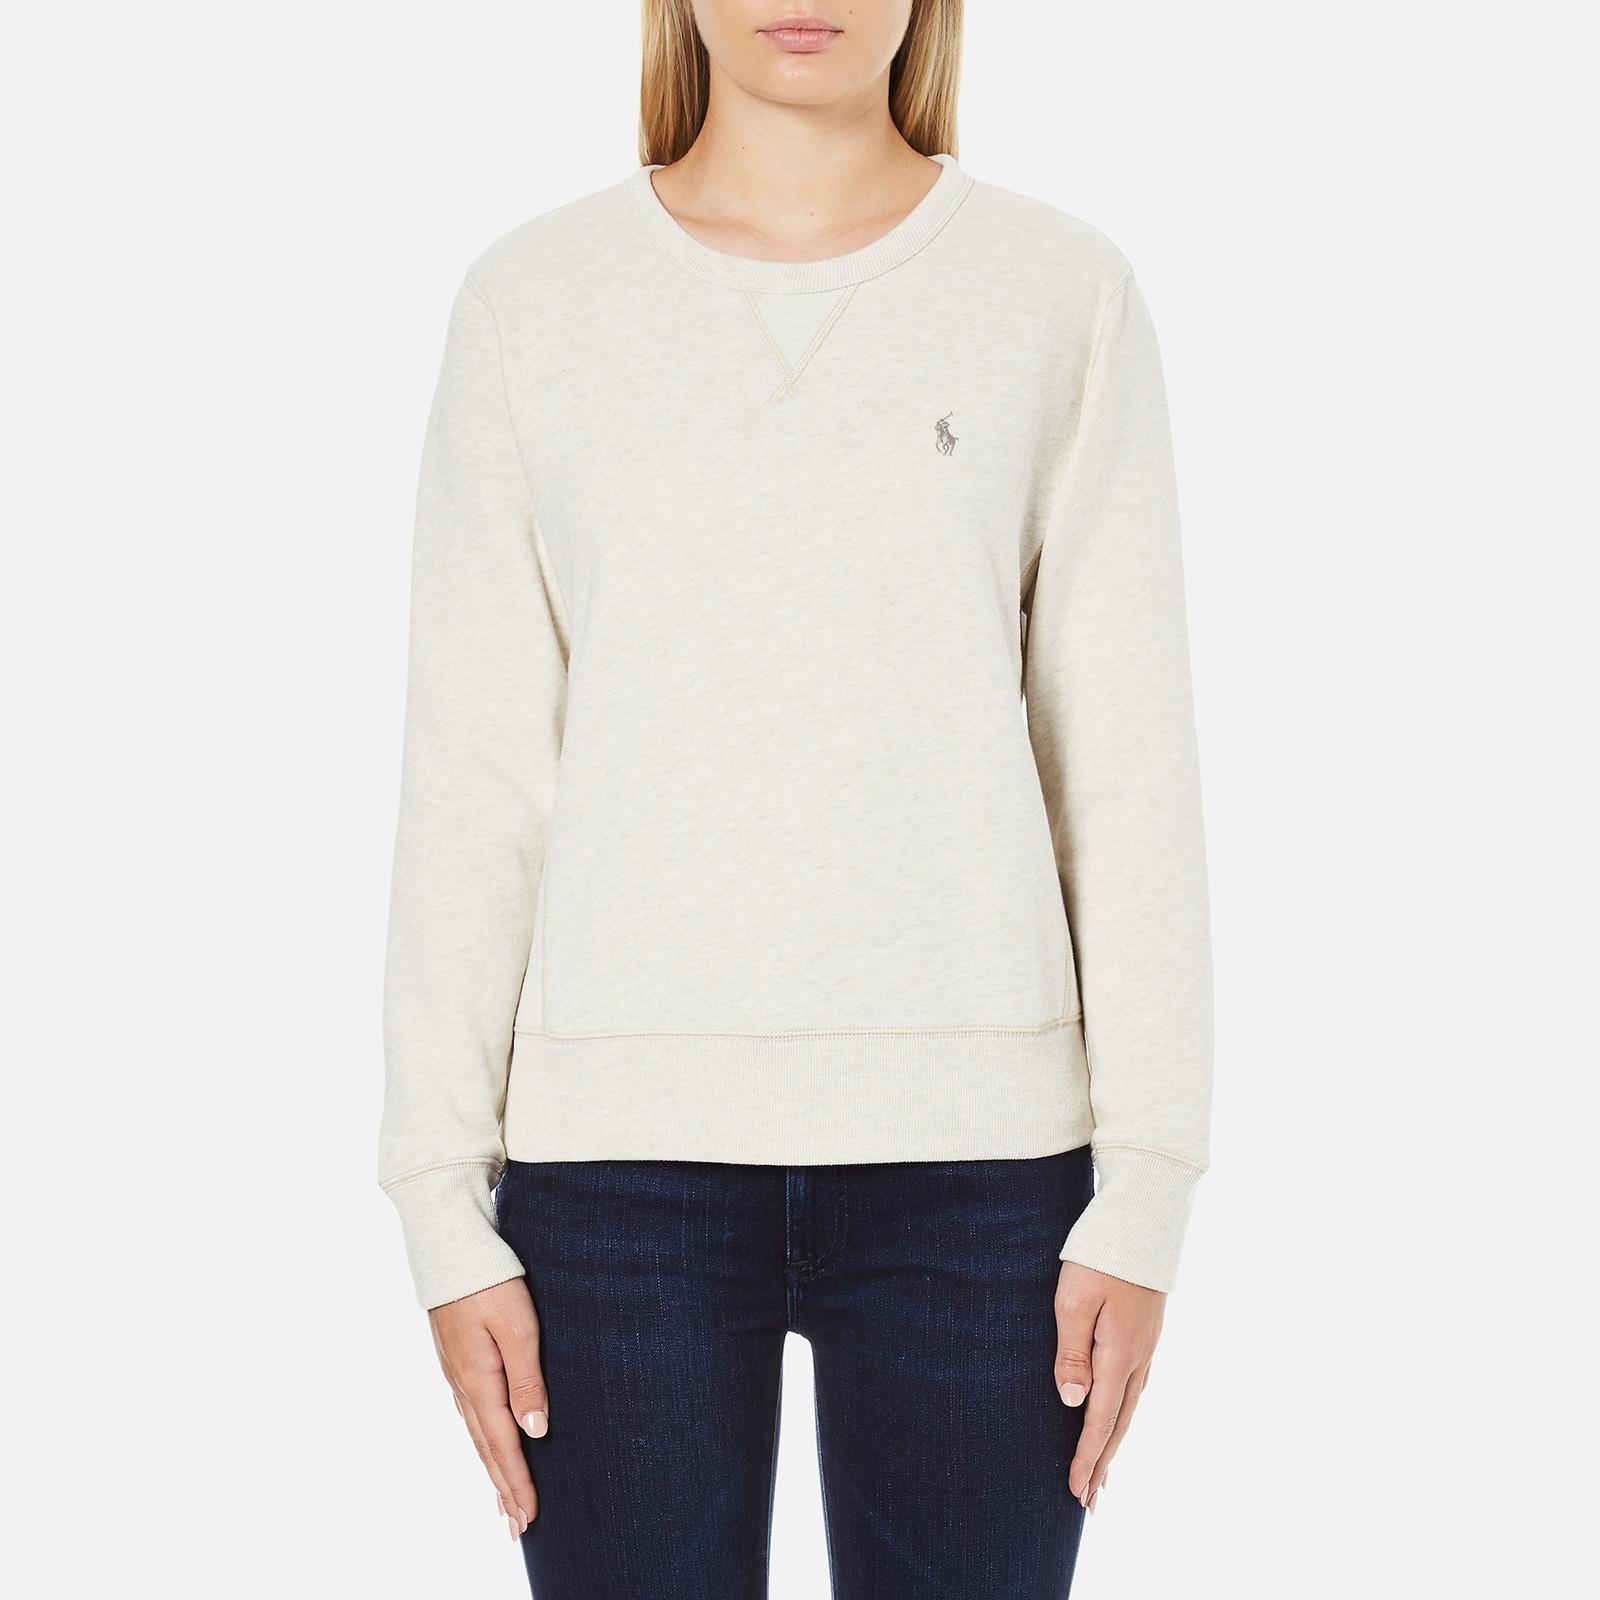 dbb25d22c7a2 Polo Ralph Lauren Women s Crew Neck Logo Sweatshirt - Chalk Heather - Free  UK Delivery over £50